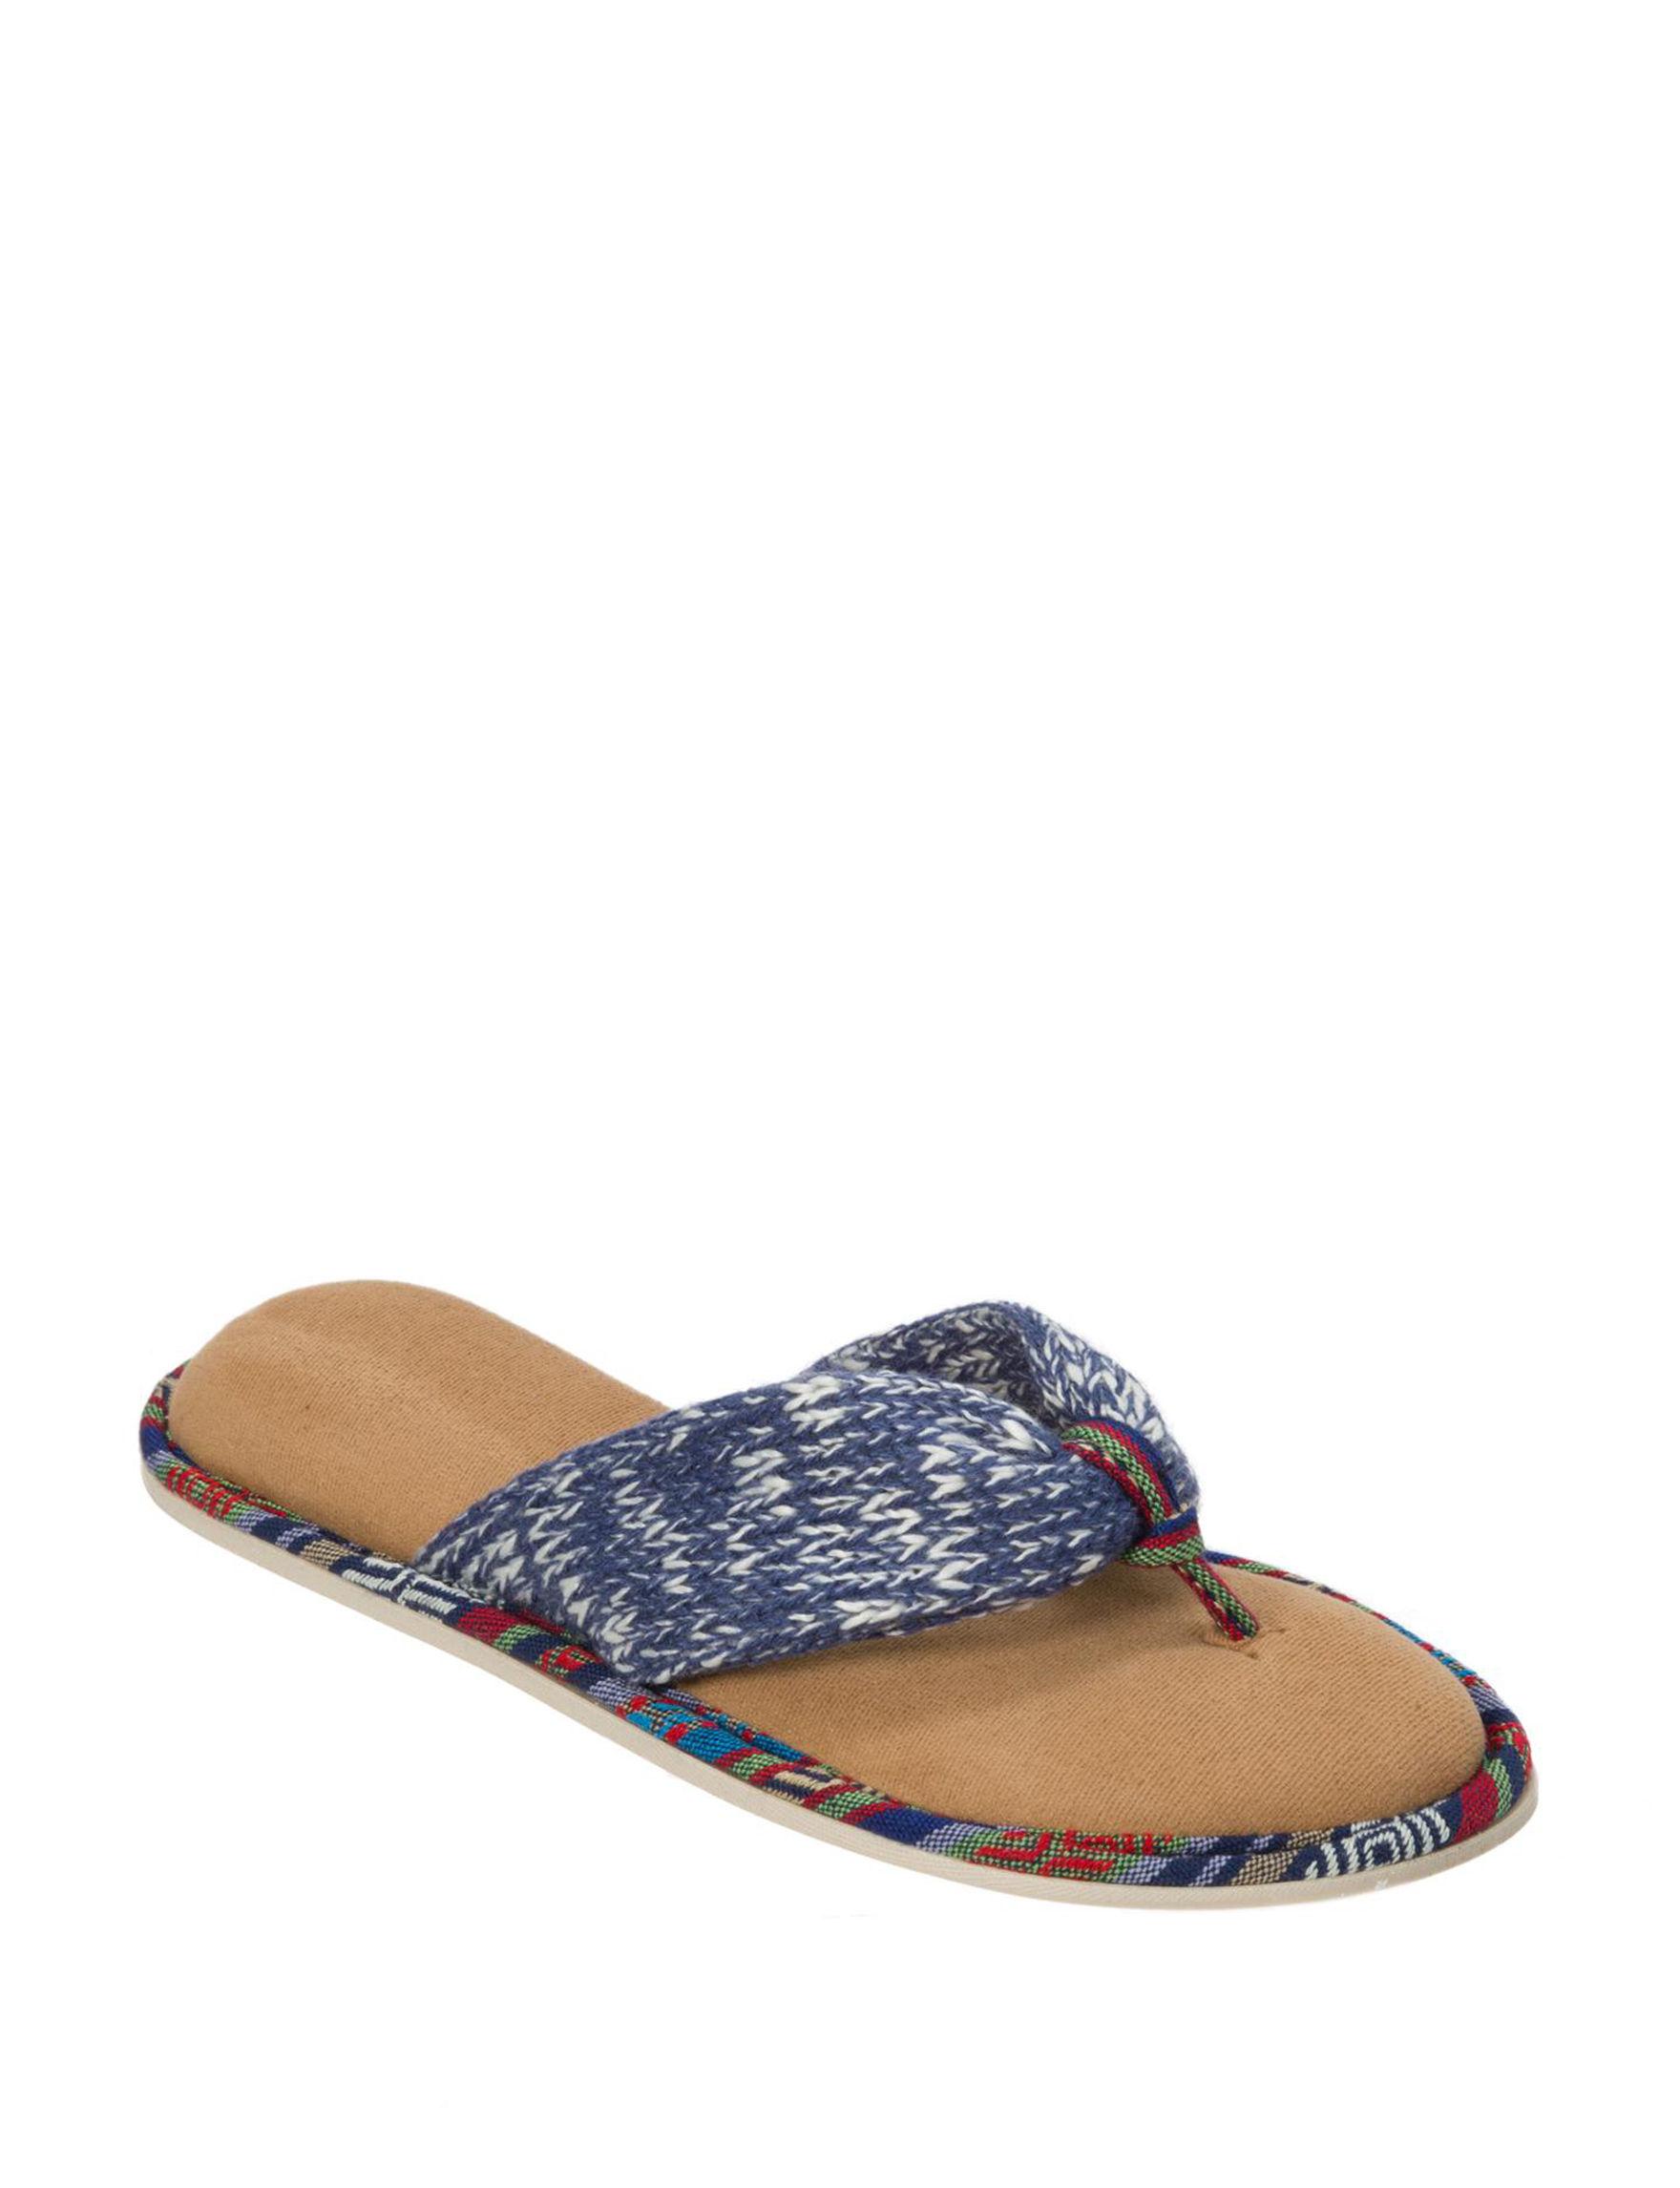 Dearfoams Indigo Slipper Sandals